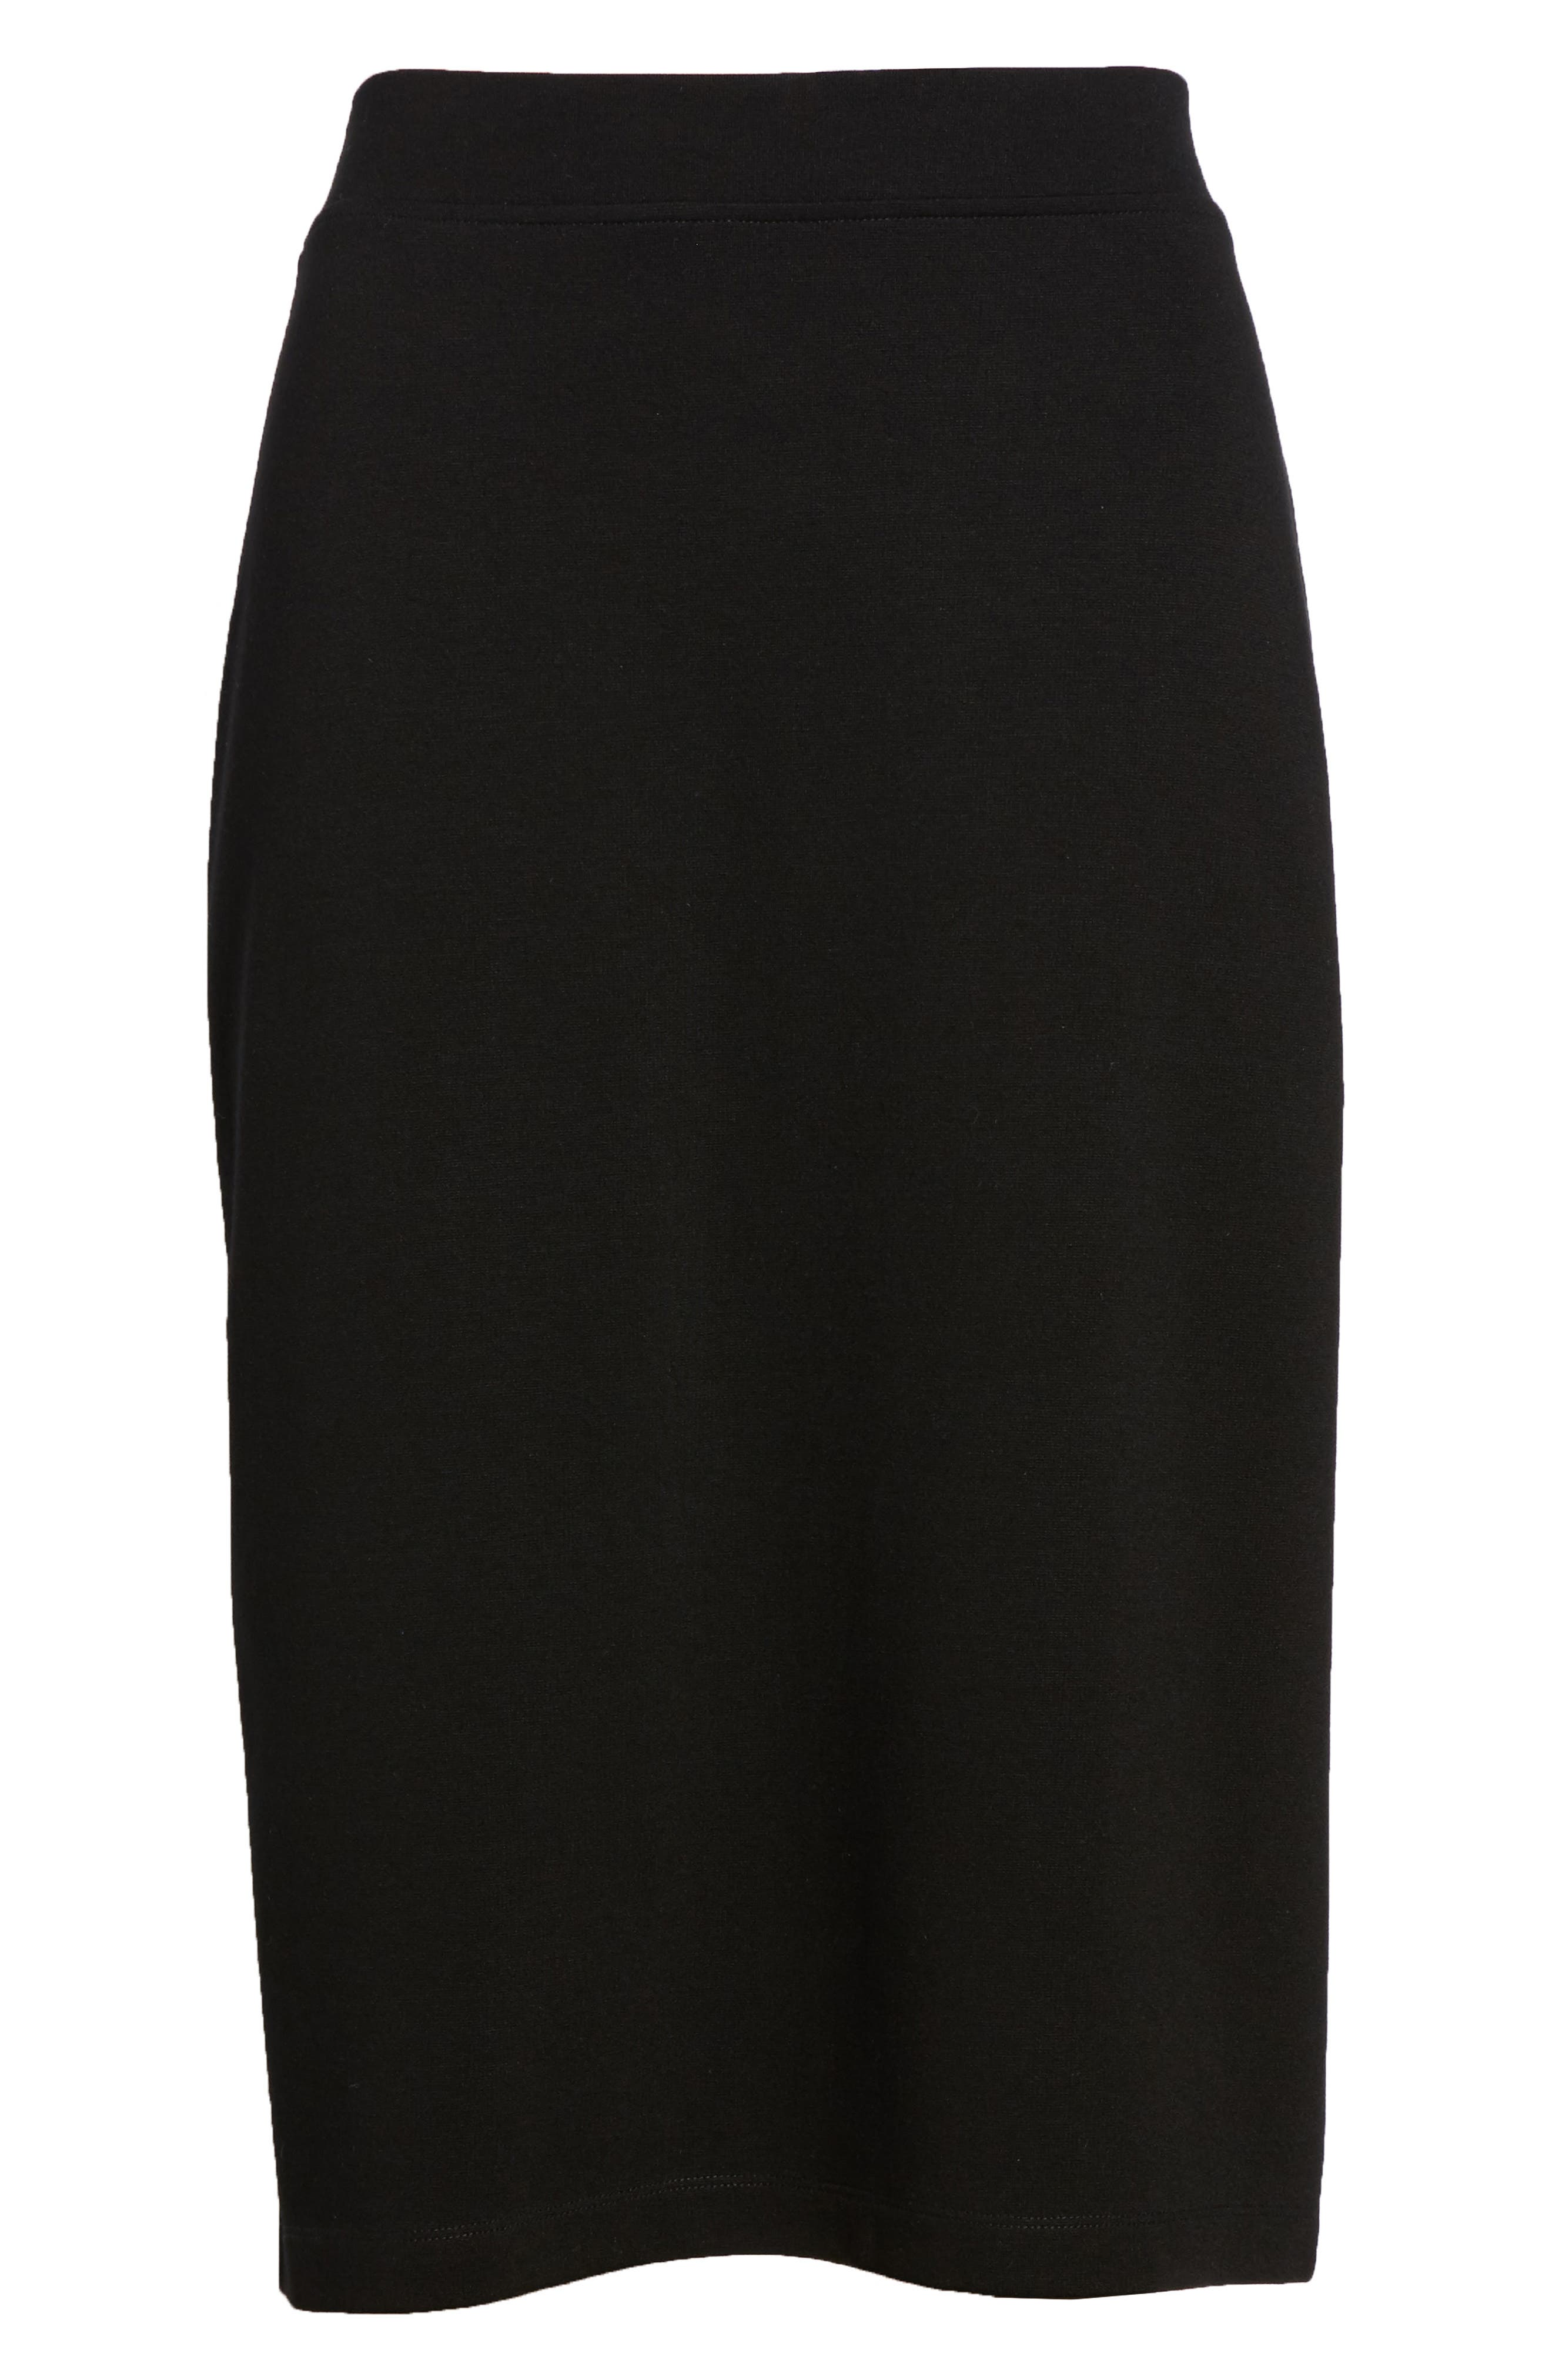 Tencel<sup>®</sup> Lyocell Blend Knit Pencil Skirt,                             Alternate thumbnail 6, color,